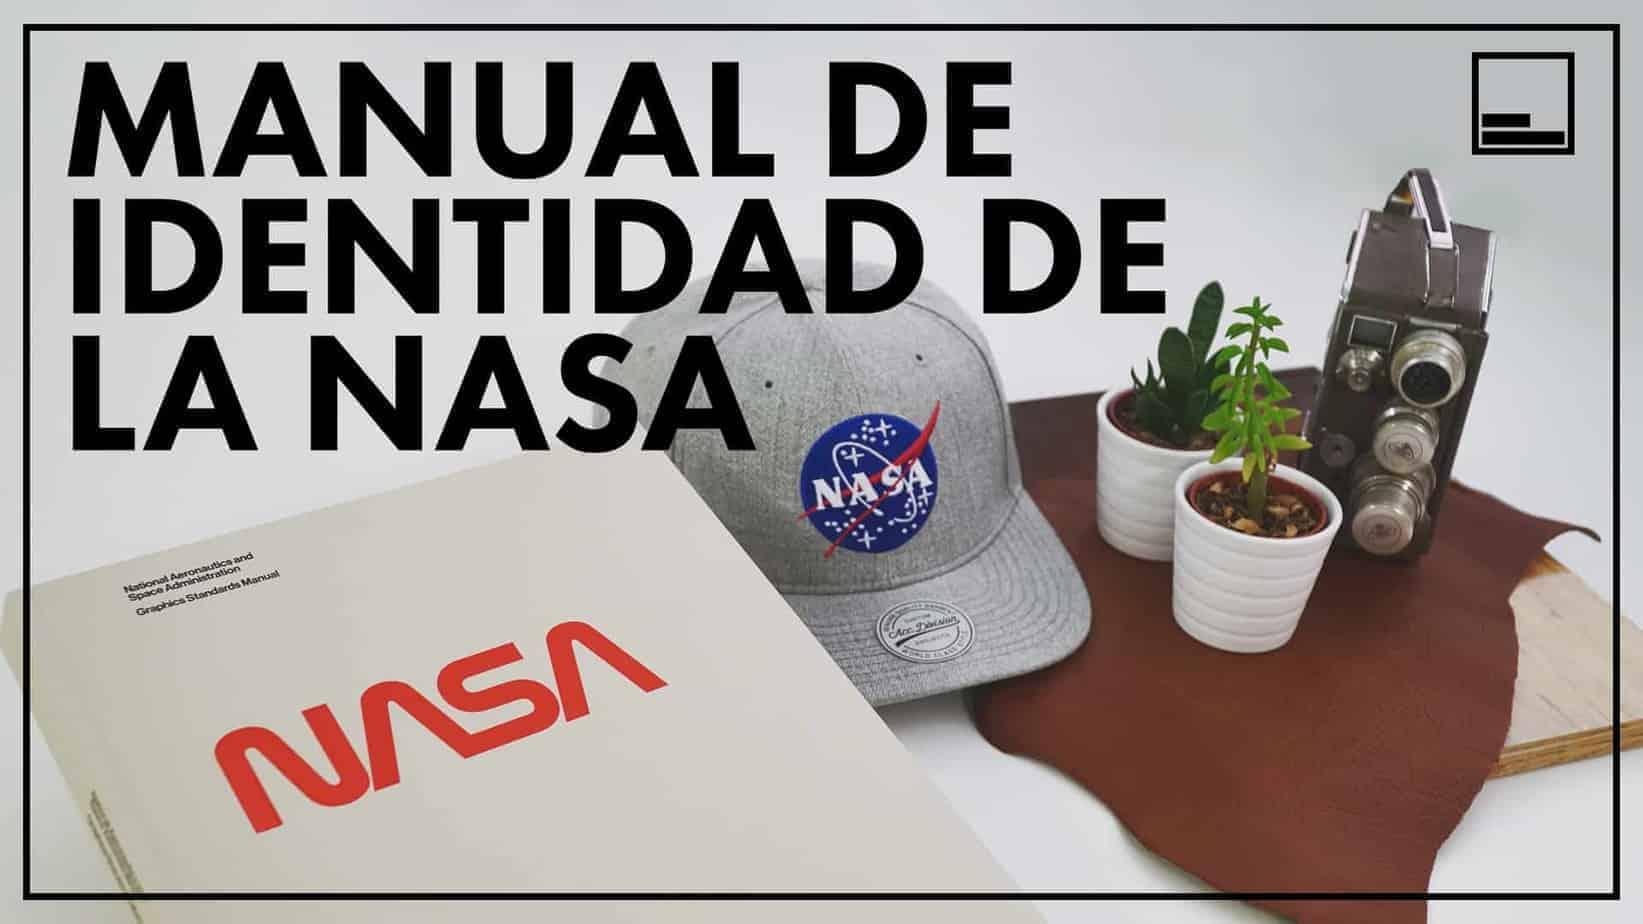 NASA 1975 GRAPHICS STANDARTS MANUAL NATIONAL AERONAUTICS AND SPACE ADMINISTRATION